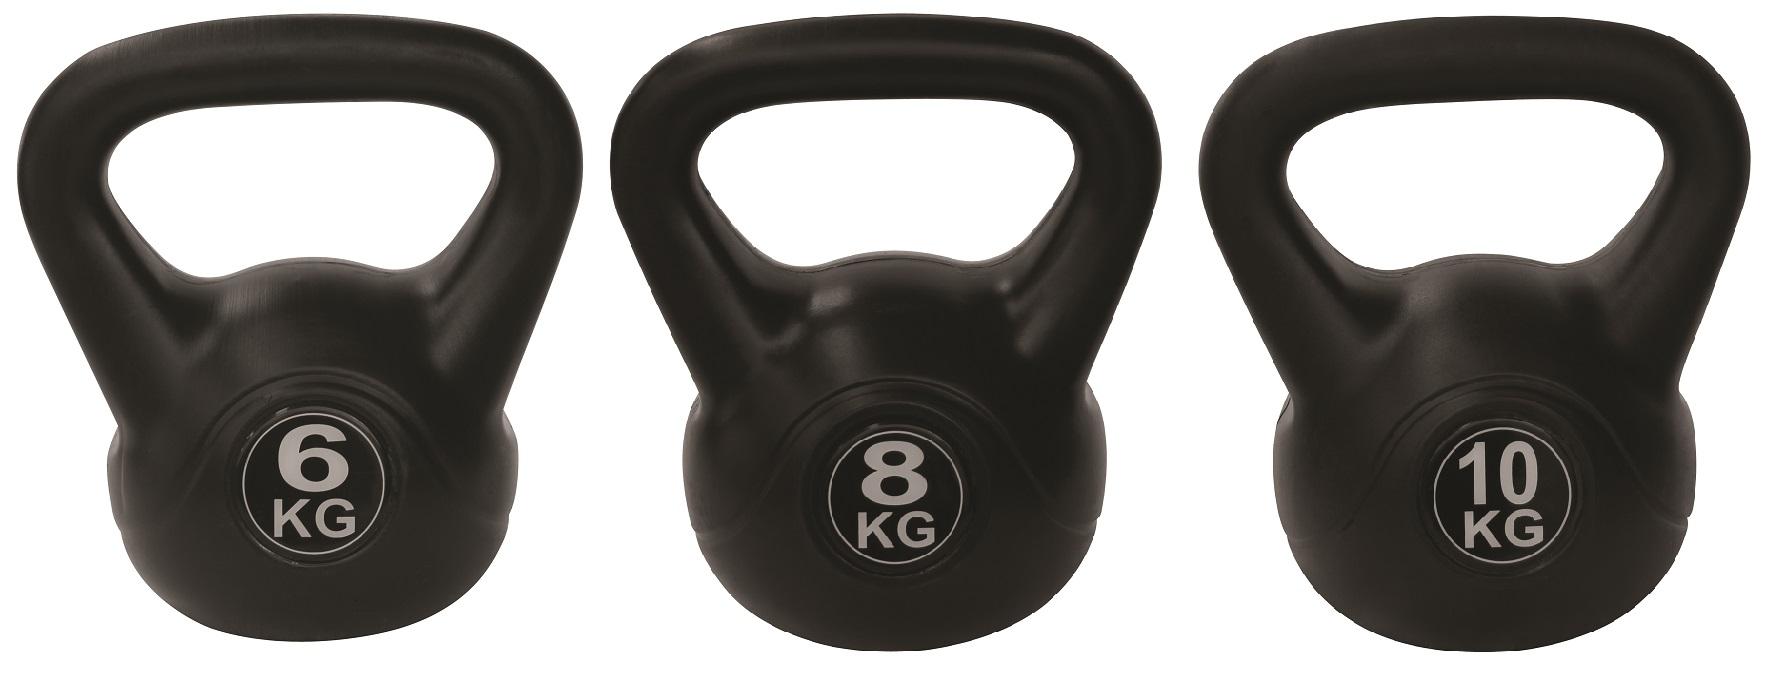 RS Aerobic Kettlebell 10KG